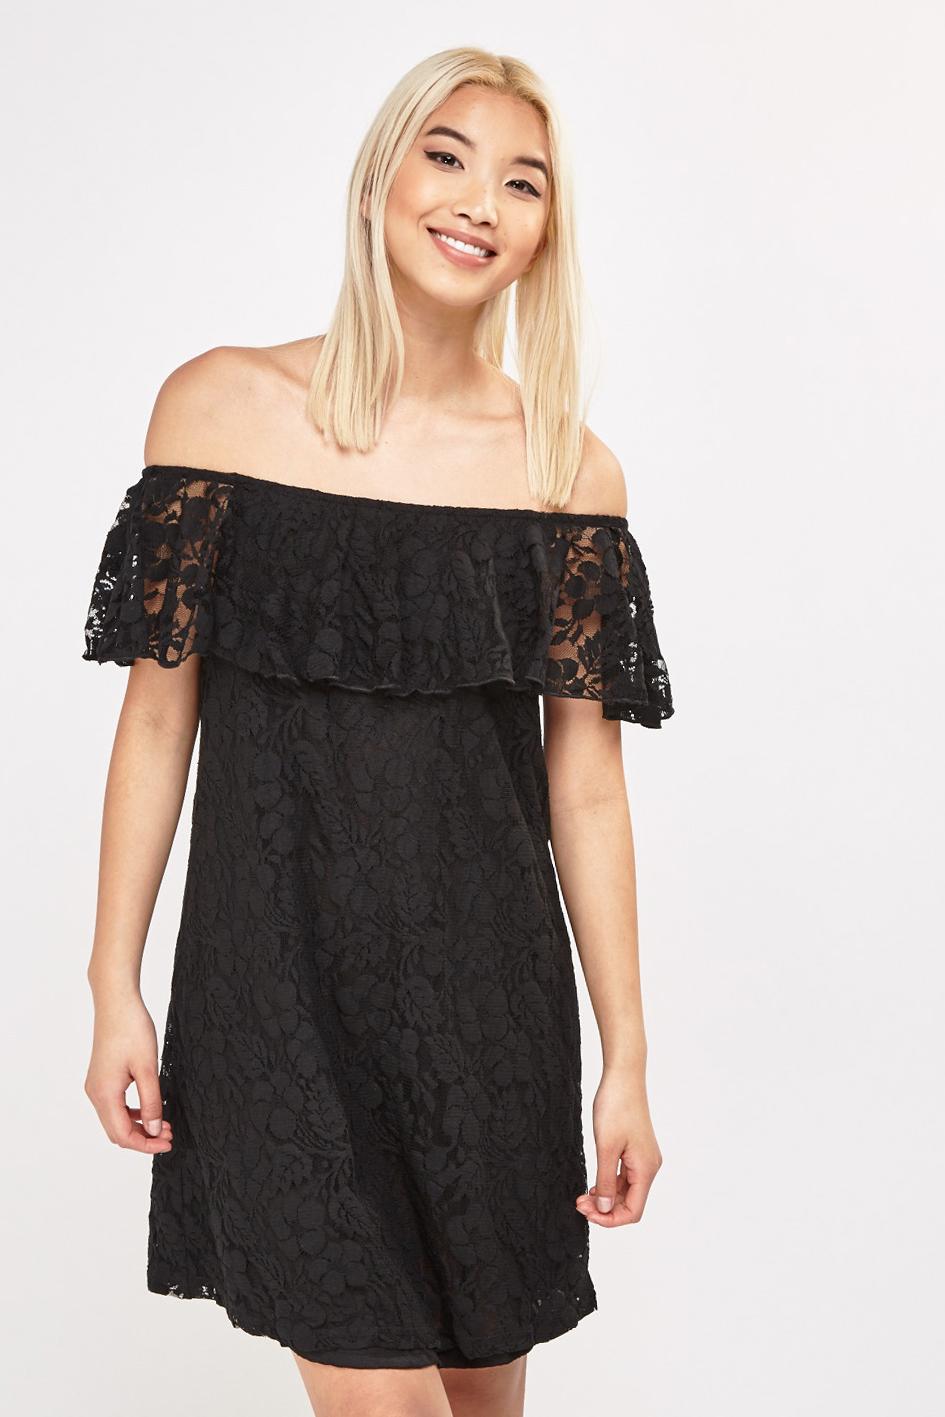 51ead7d164721 Lace Off Shoulder Bardot Dress - Black - Just £5